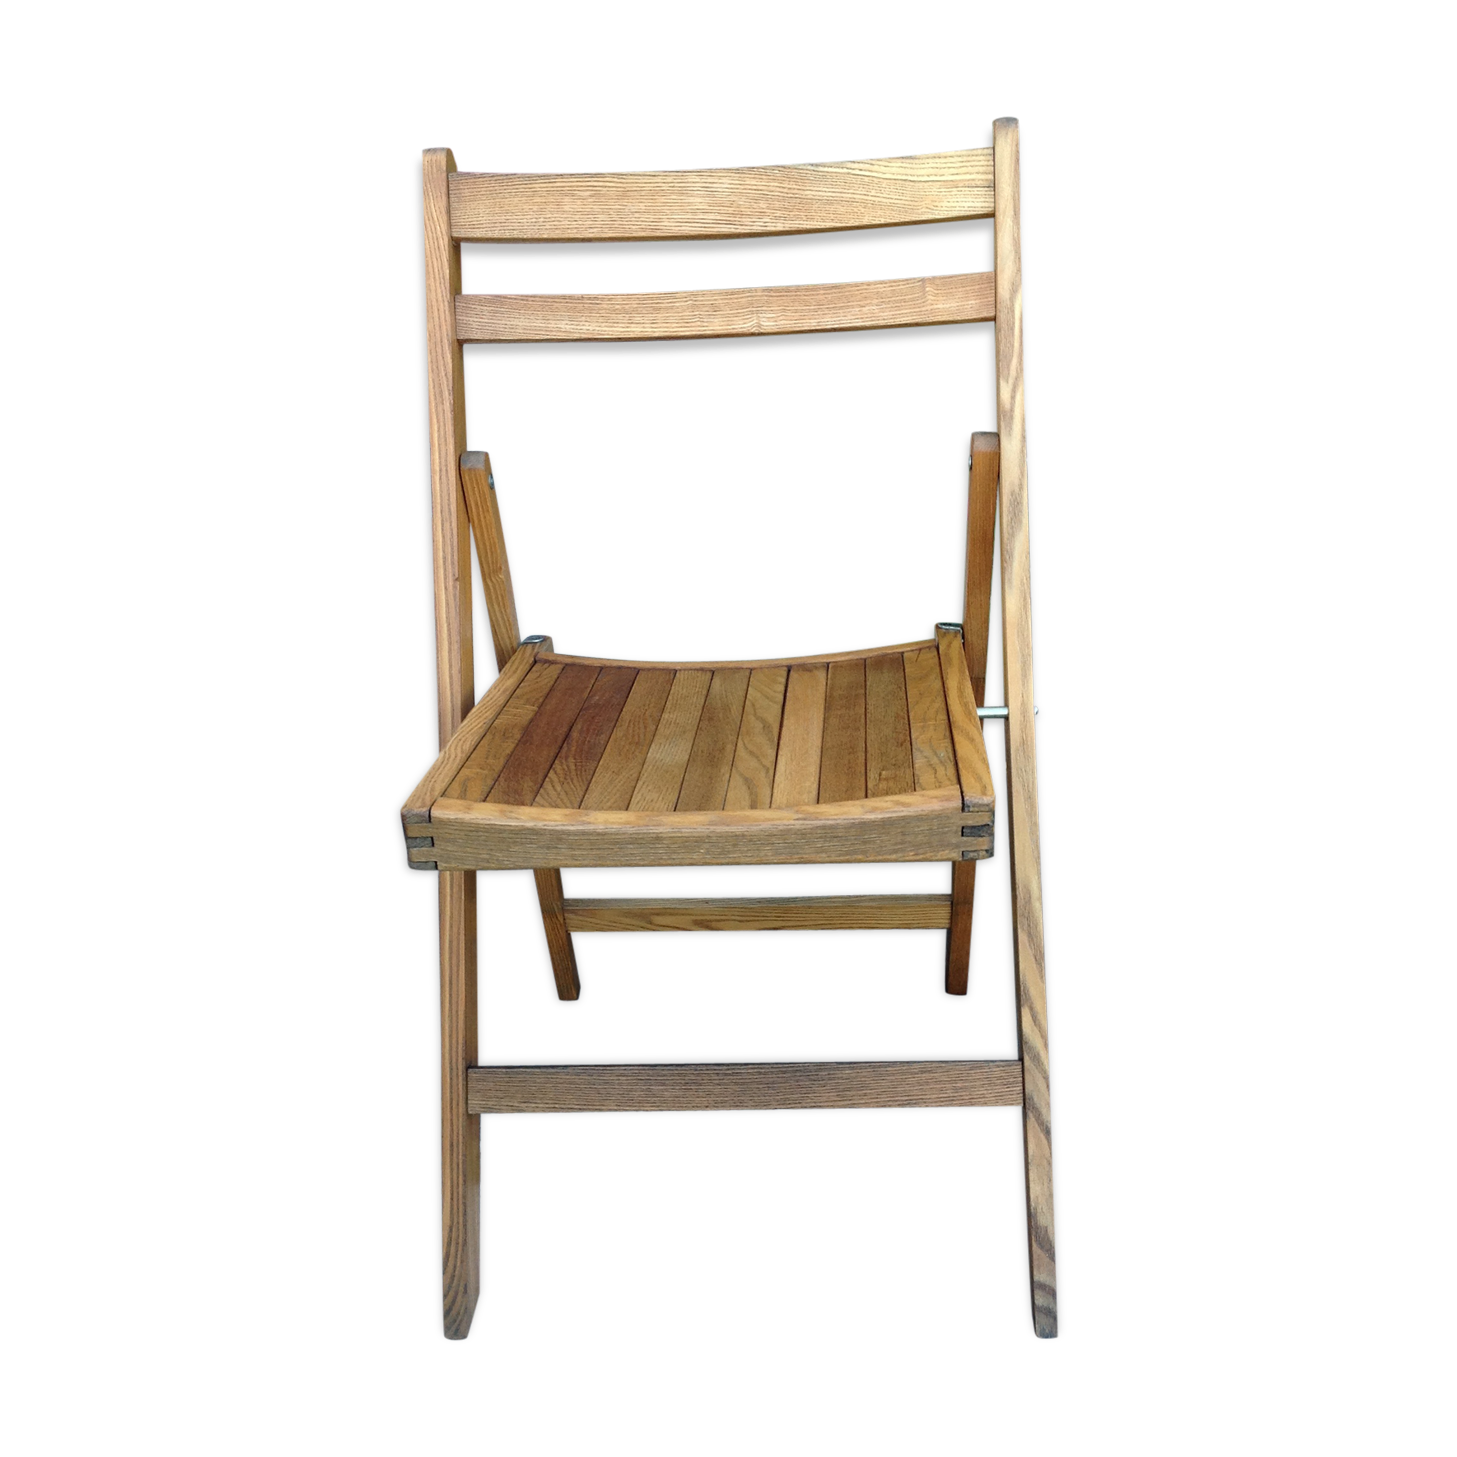 Chaise Pliante En Bois Vintage Annees 60 Outdoor Chairs Chair Chaise